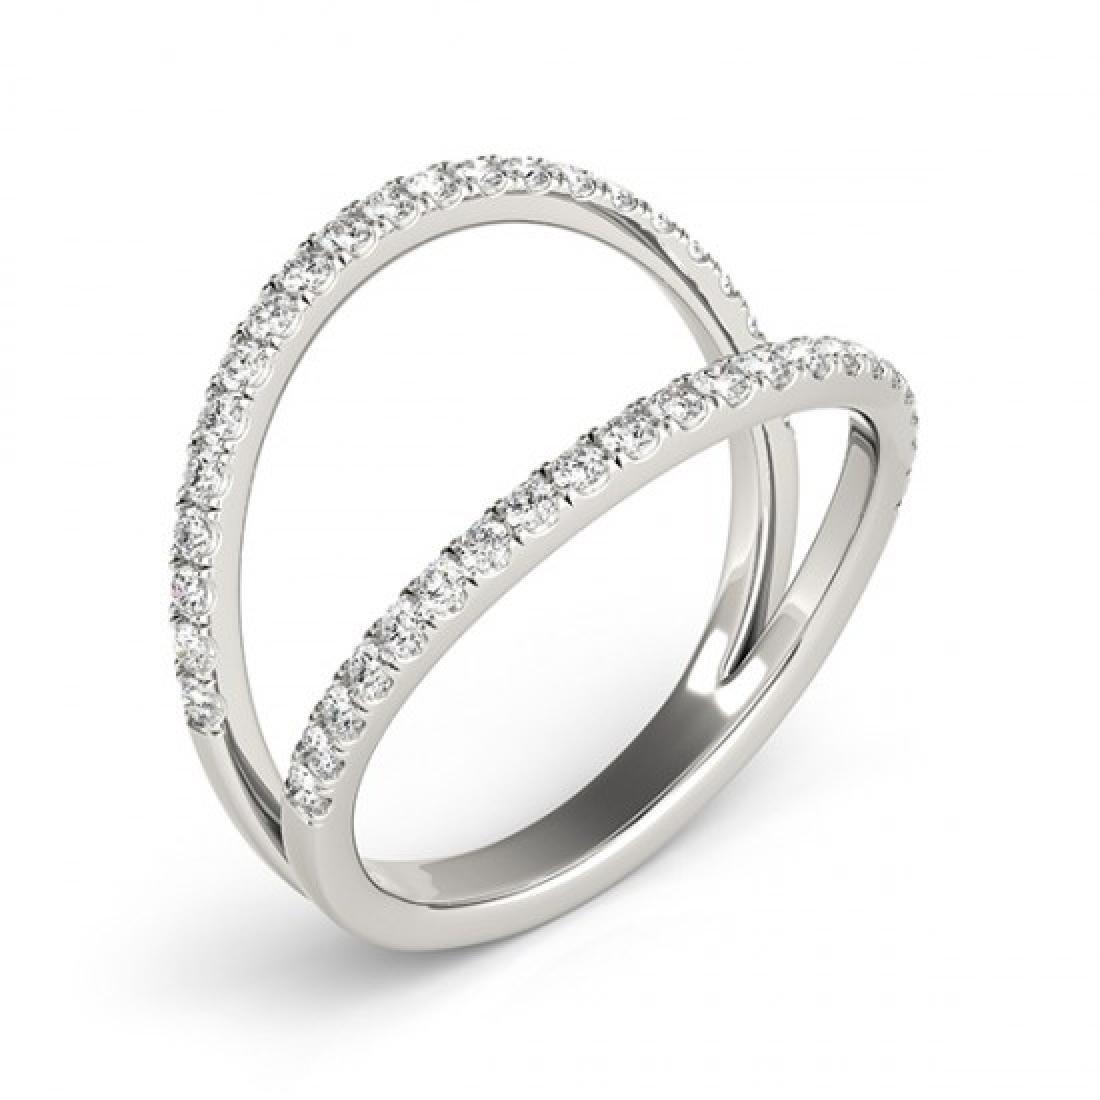 0.33 CTW Certified VS/SI Diamond Fashion Ring 14K White - 3